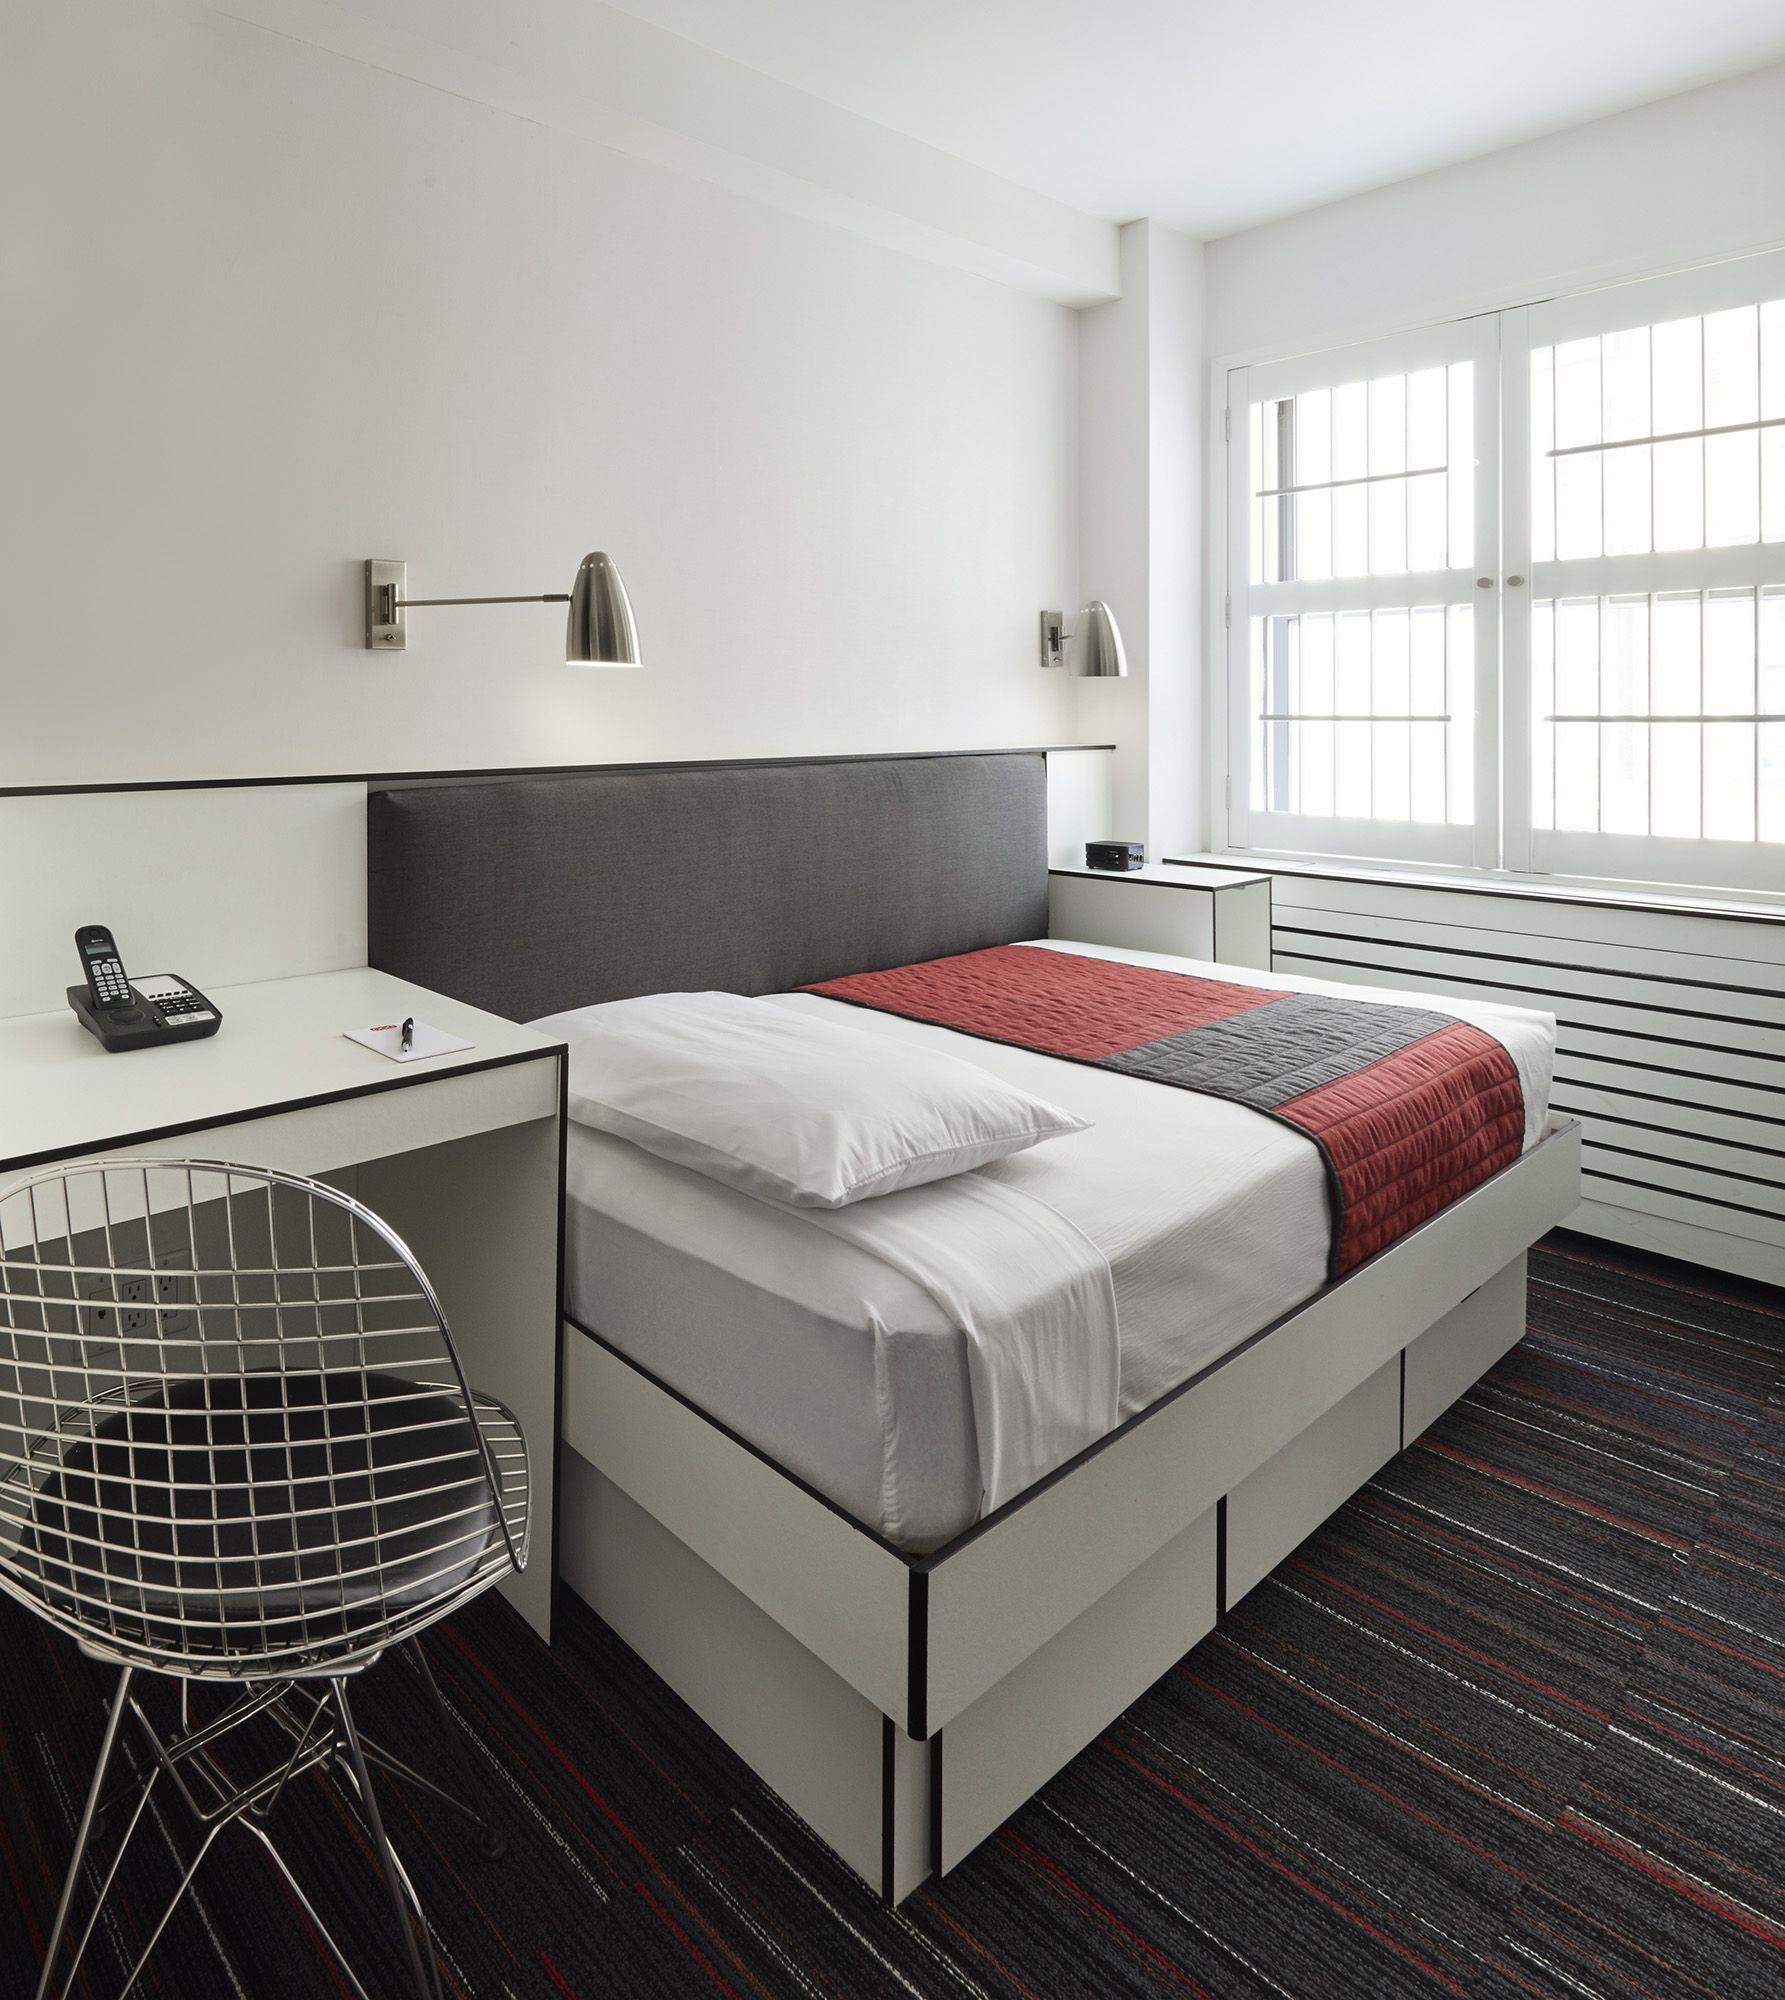 Single Pod at Pod 51 Pod 51, Pods, Affordable hotels